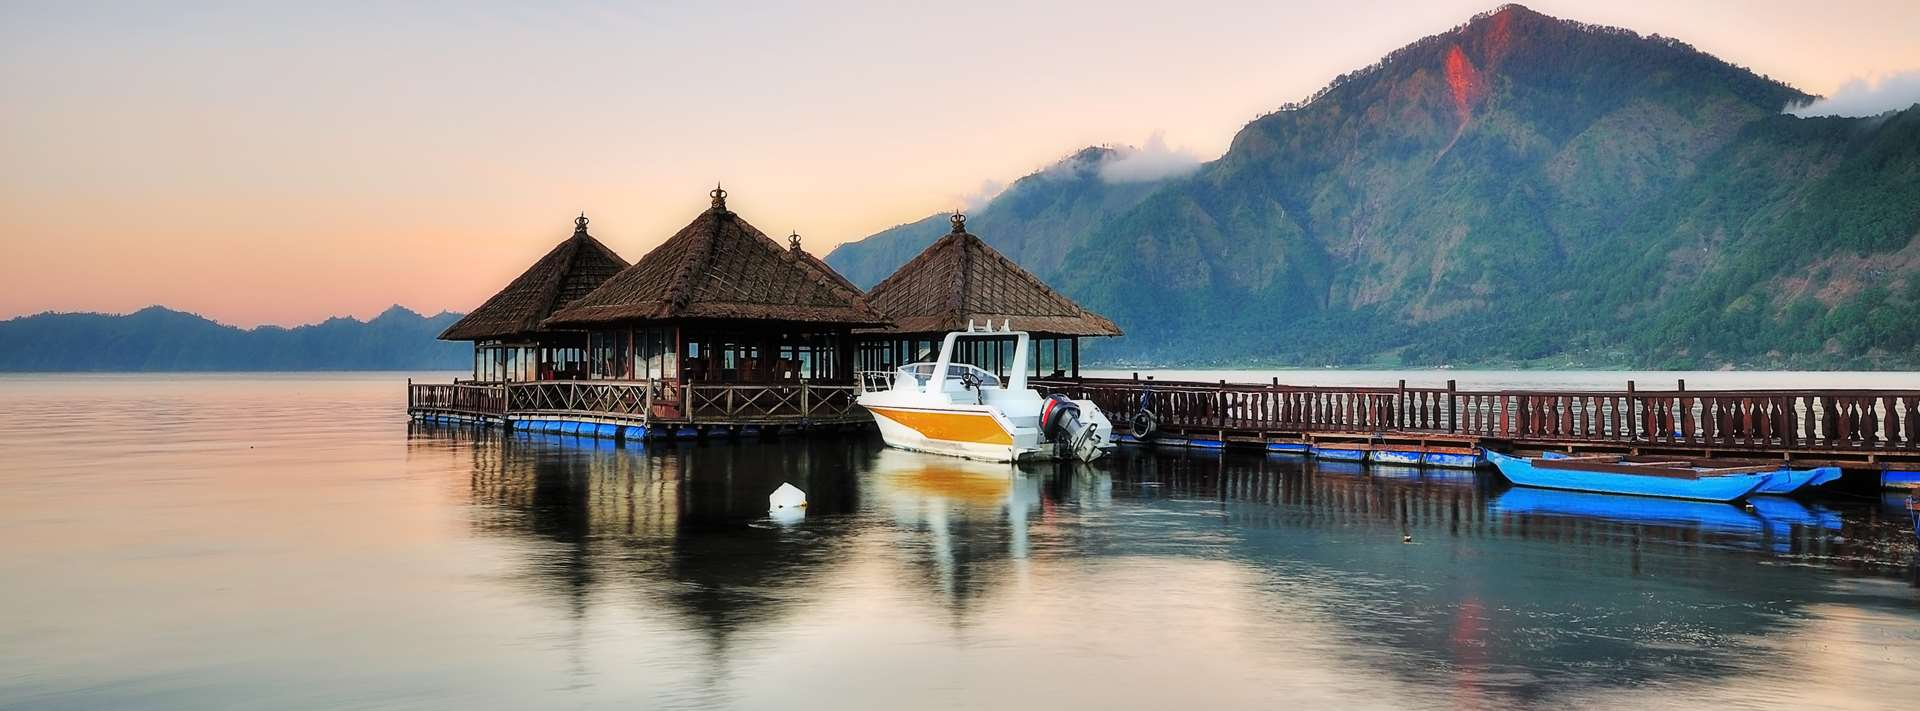 Cheap Flight To Bali